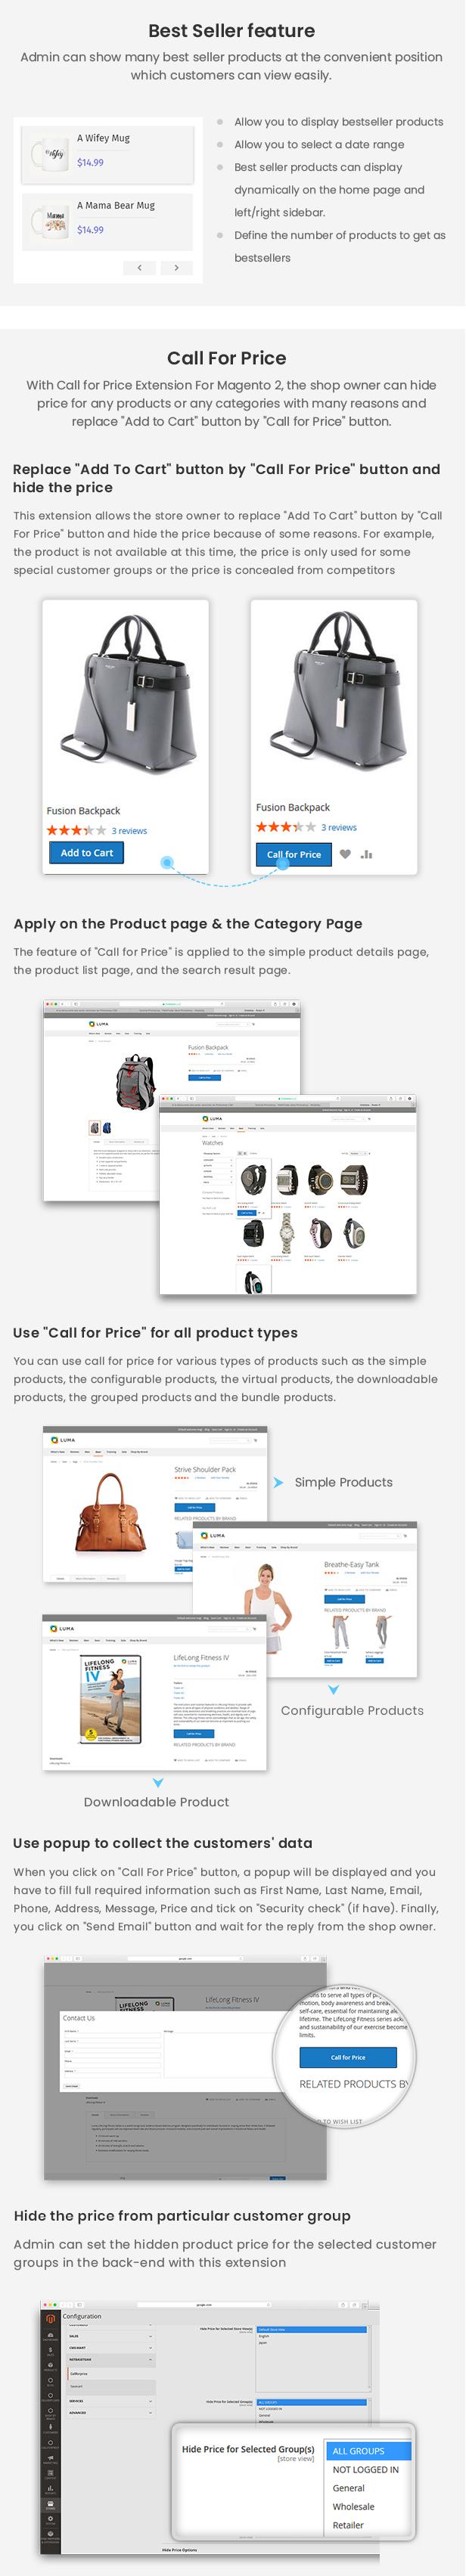 Printshop - Responsive Magento Printing Theme - 36